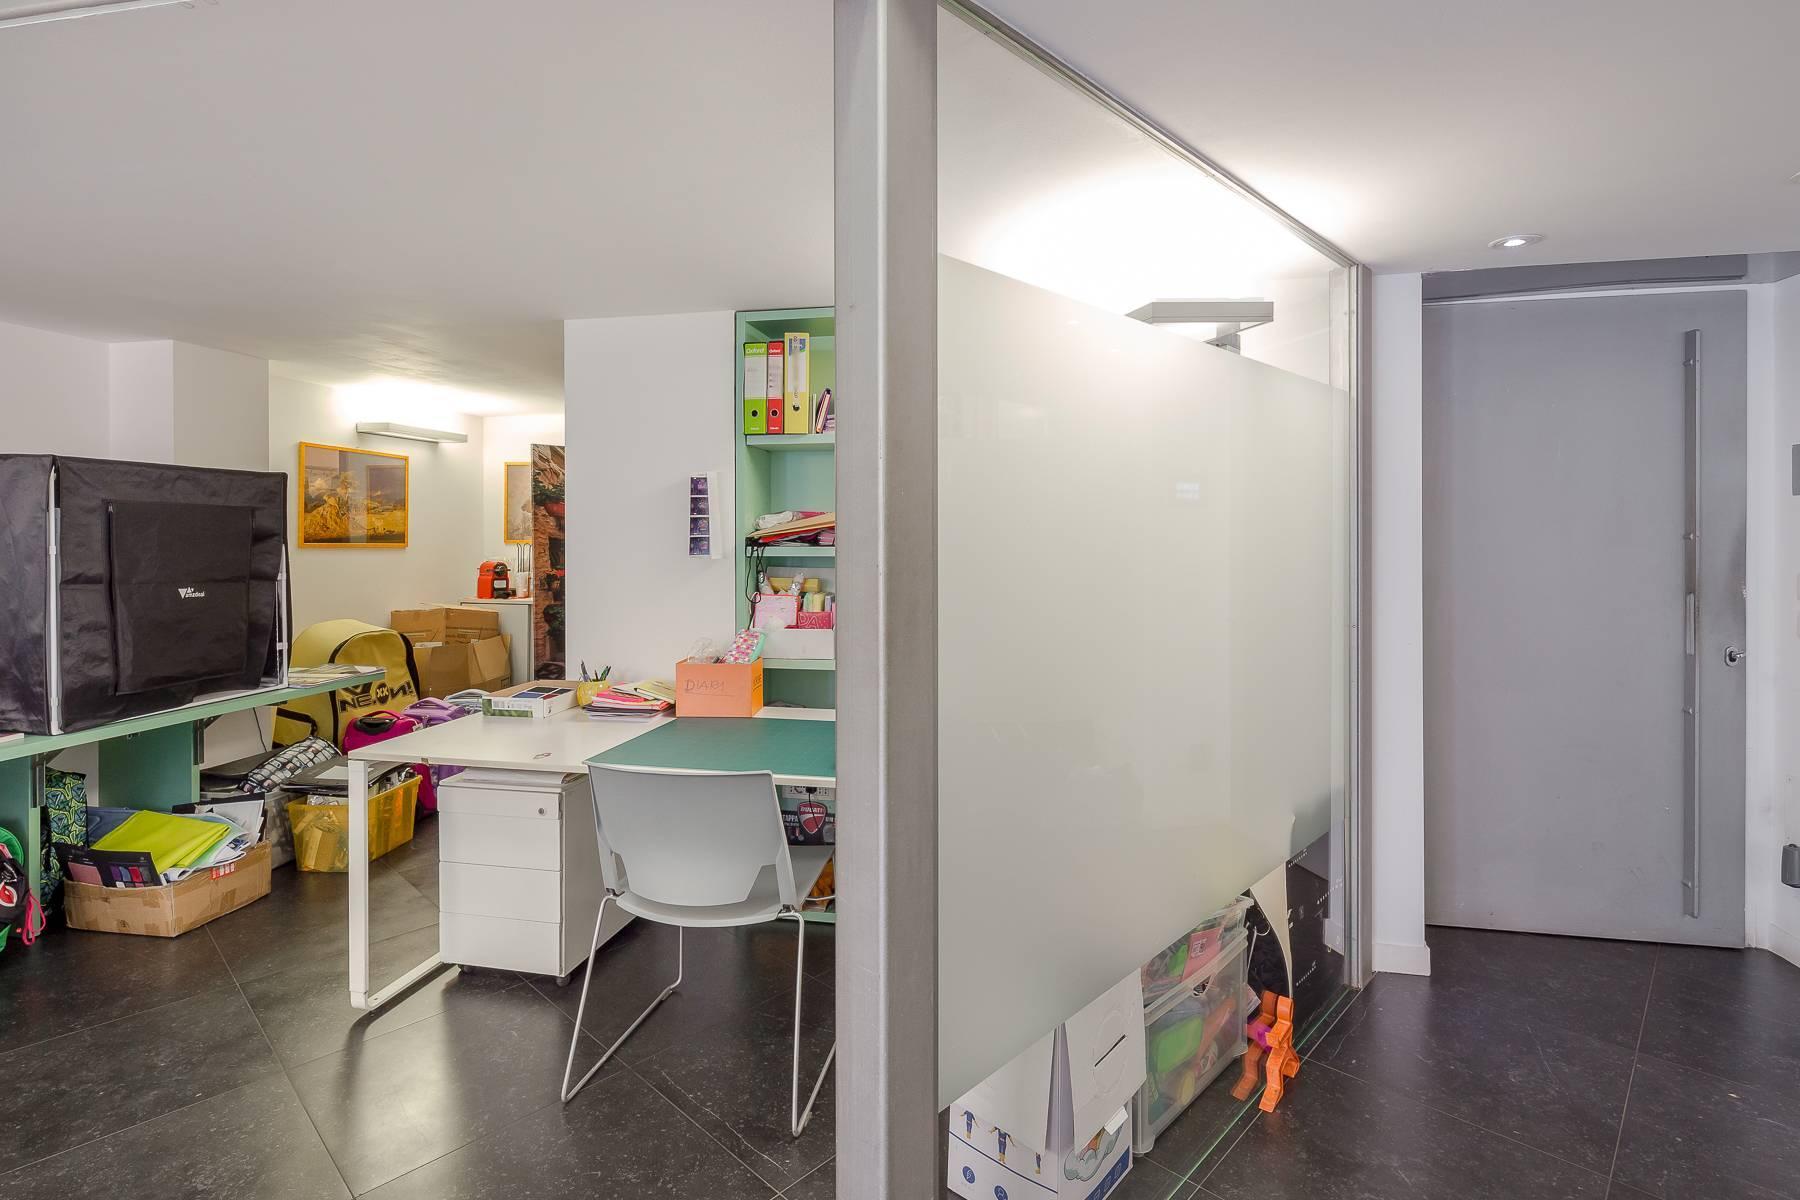 Open space office/residential property in Piazza Giovine Italia/Via Aurelio Saffi - 19